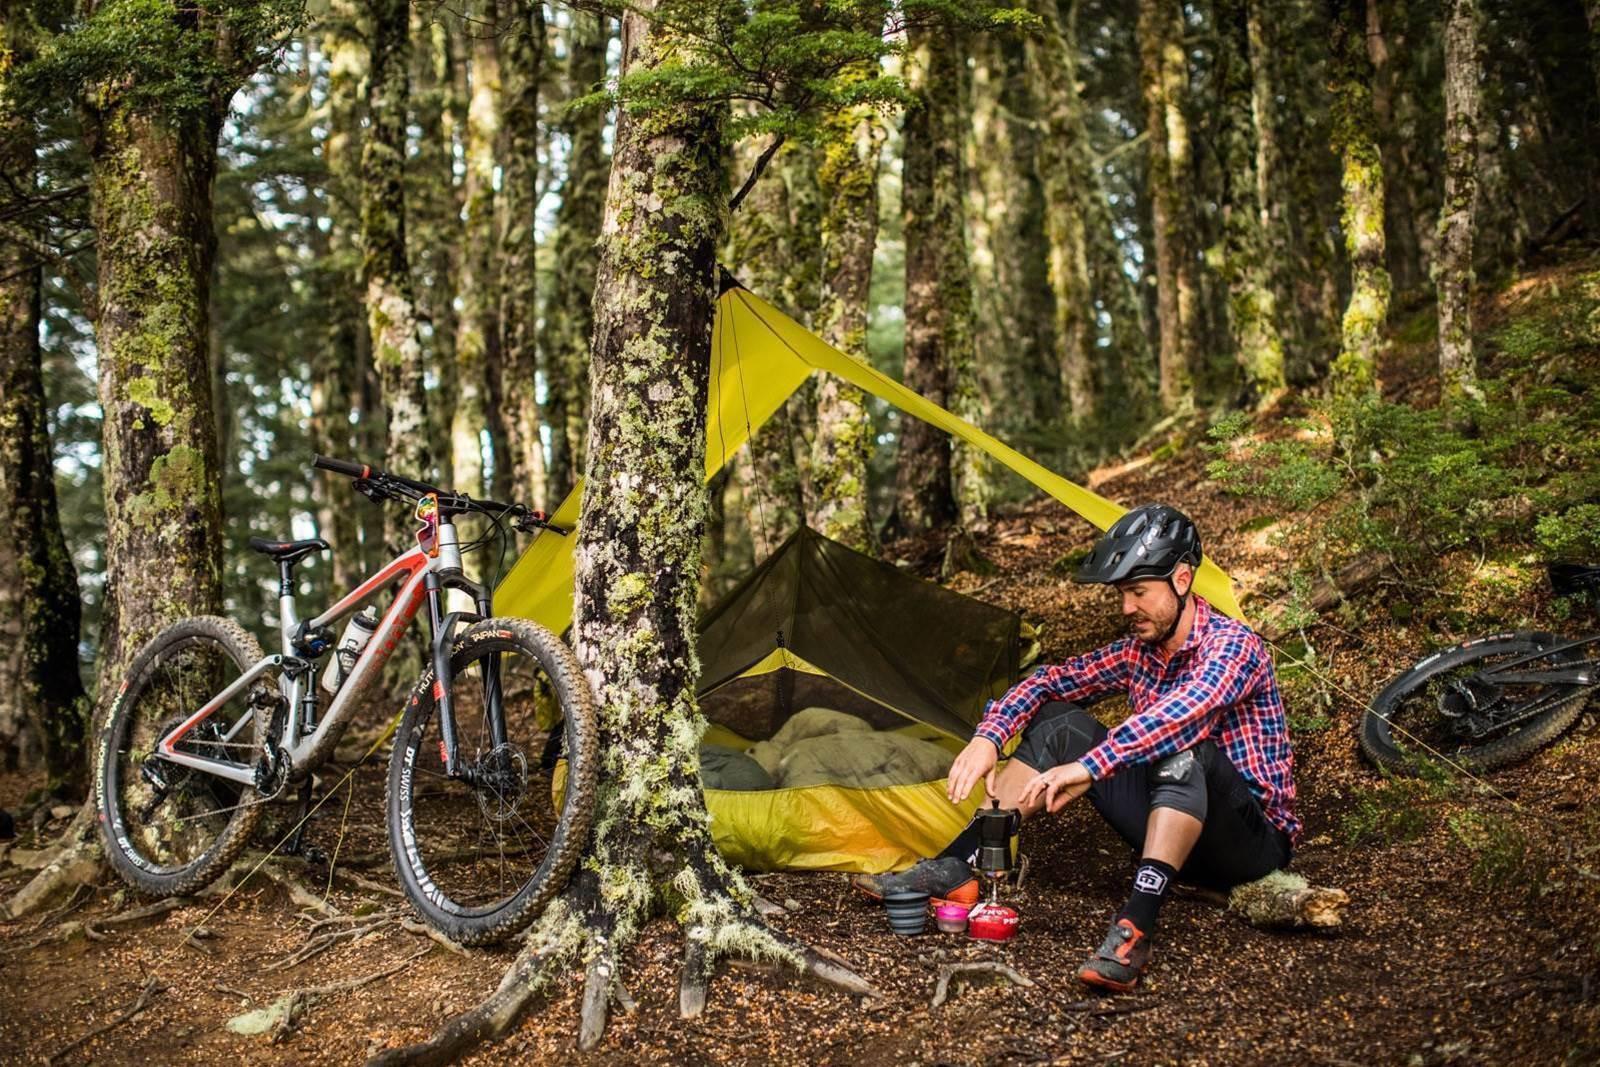 TESTED: Sea to Summit Bikepacking gear